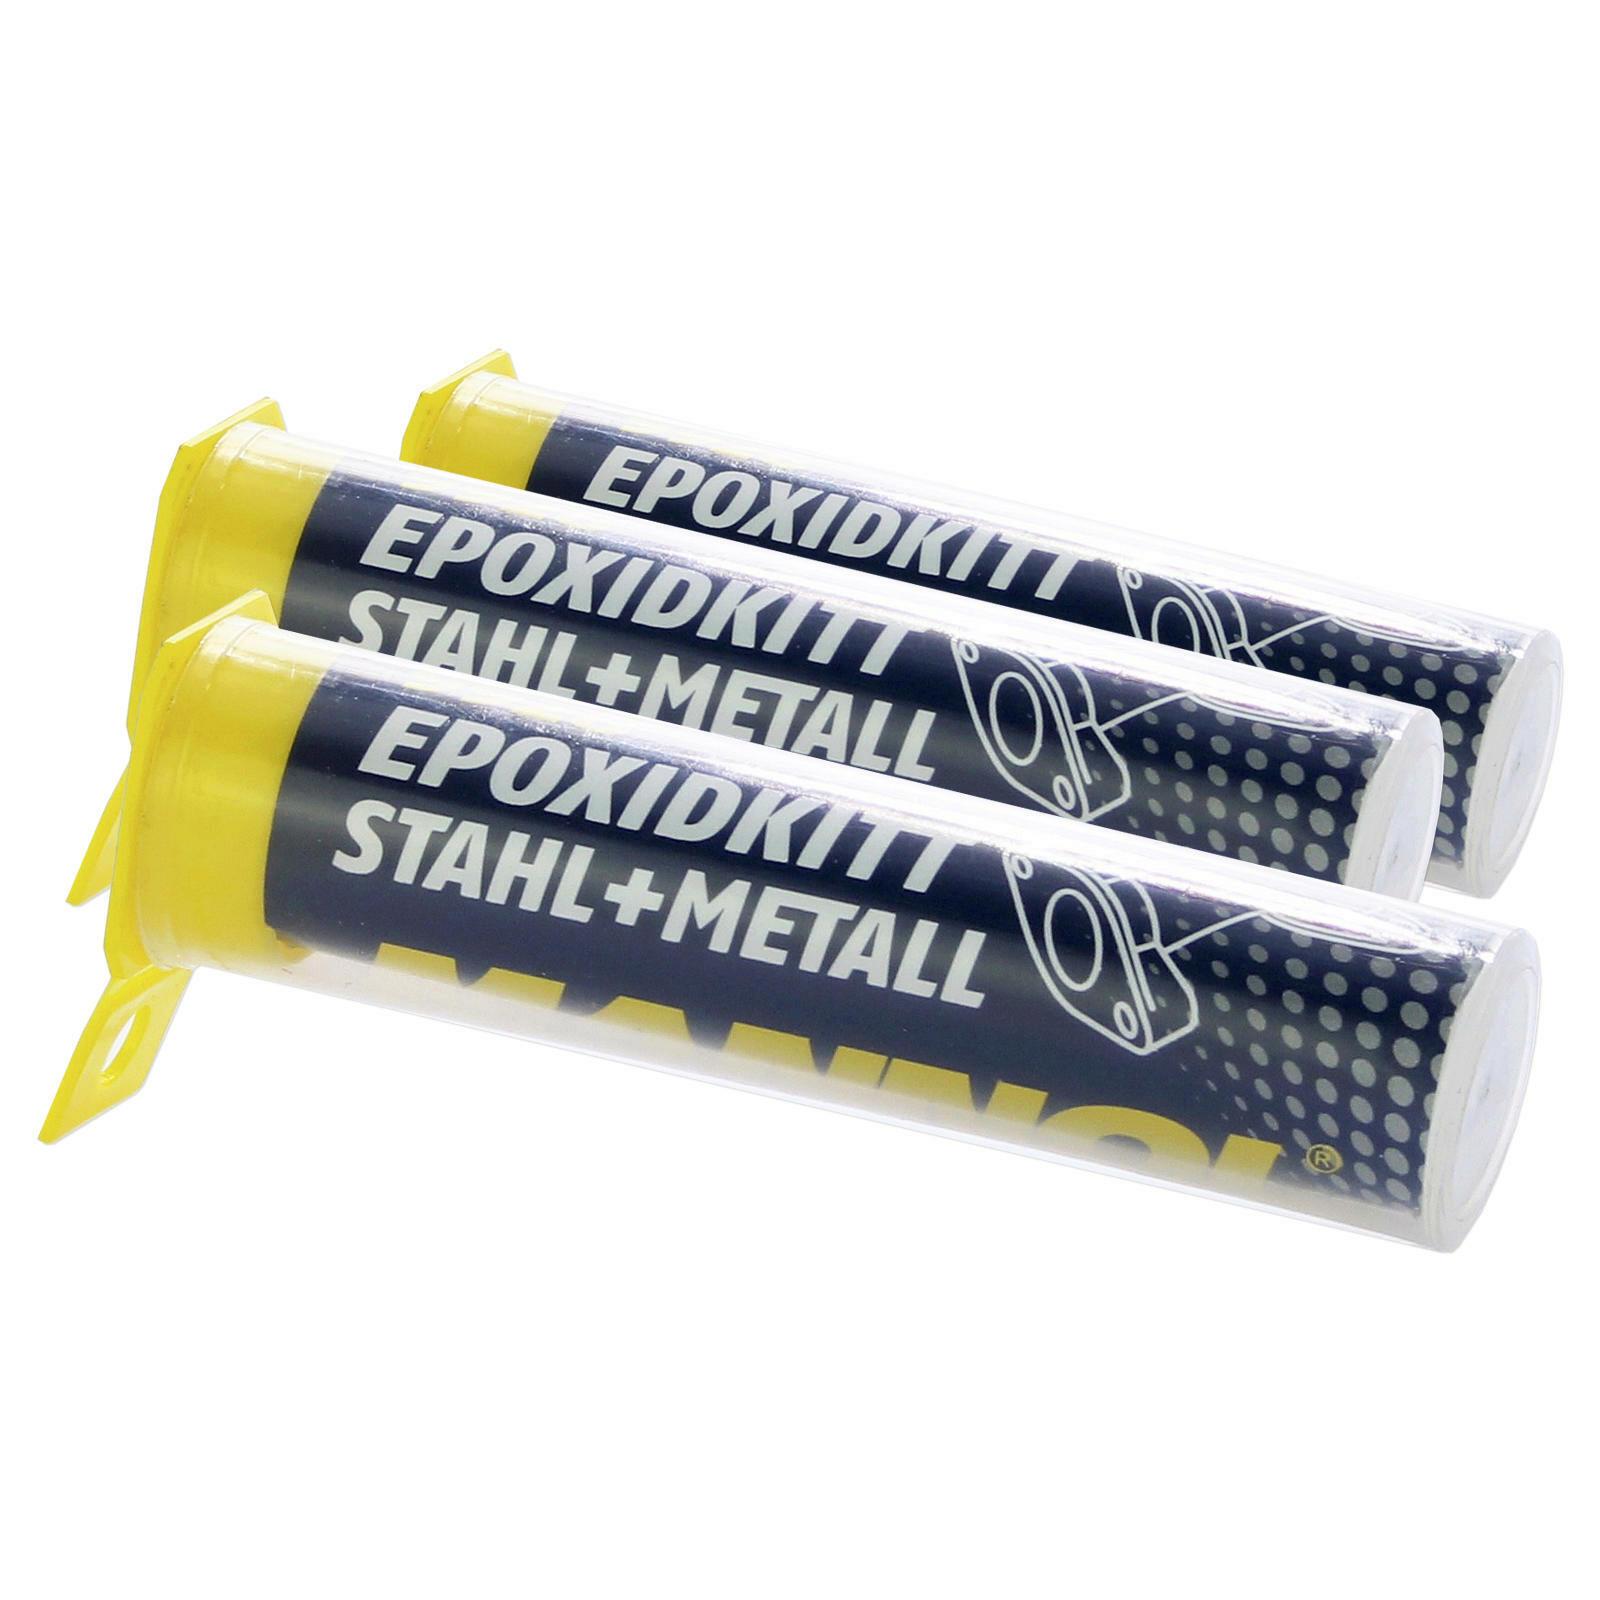 3x mannol epoxidkitt 9928 56g epoxyspachtel 2-komponentenkleber